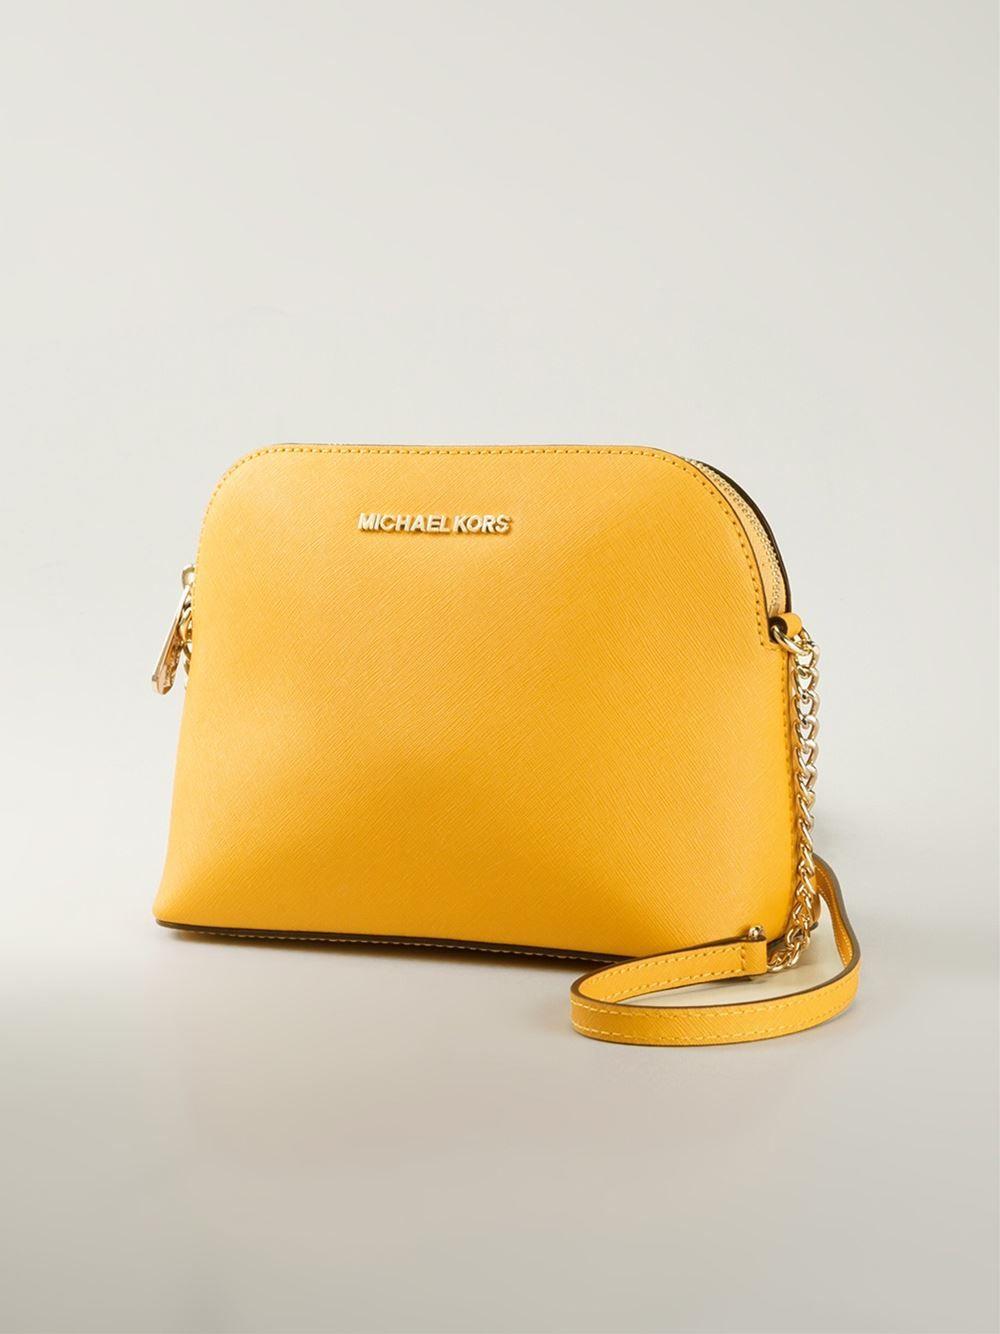 3159d13c74d049 Michael kors Cindy Large Calf-Leather Cross-Body Bag in Yellow (yellow &  orange) | Lyst